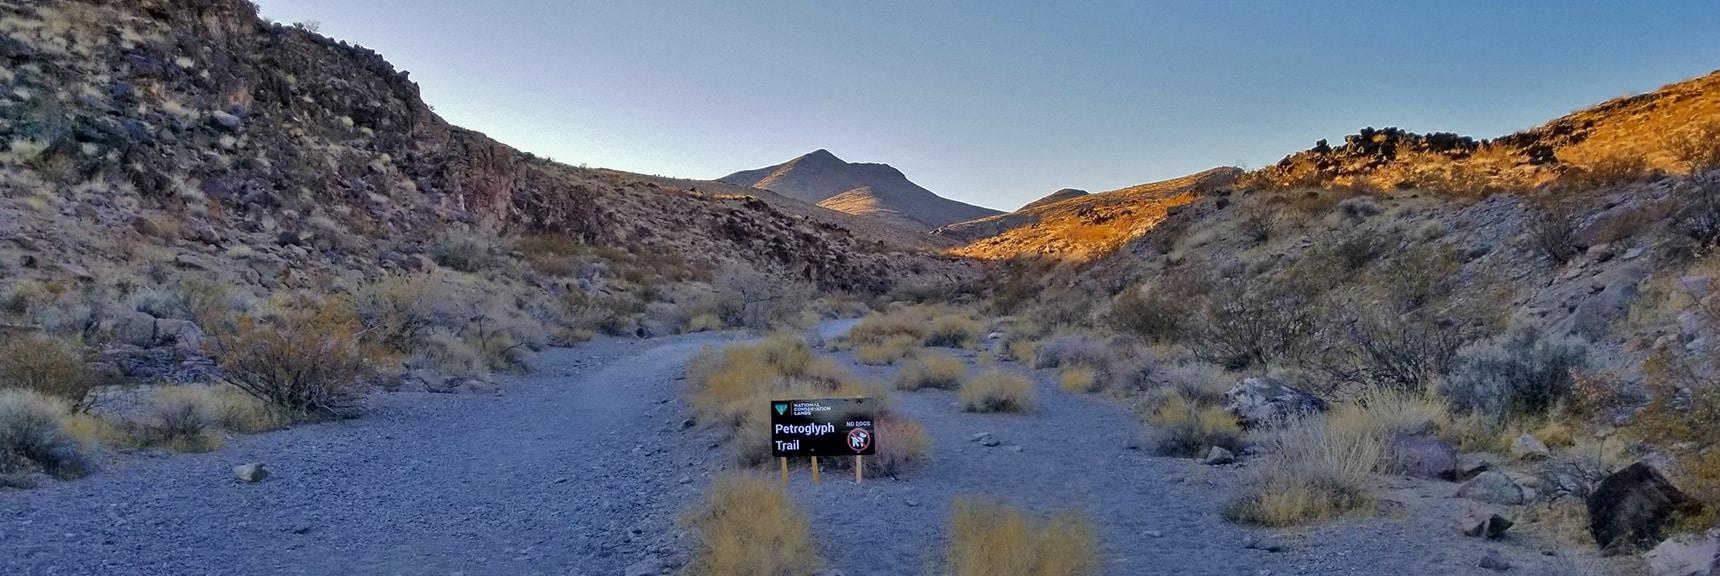 Heading Up Lower Petroglyph Canyon | Petroglyph Canyon | Sloan Canyon National Conservation Area, Nevada